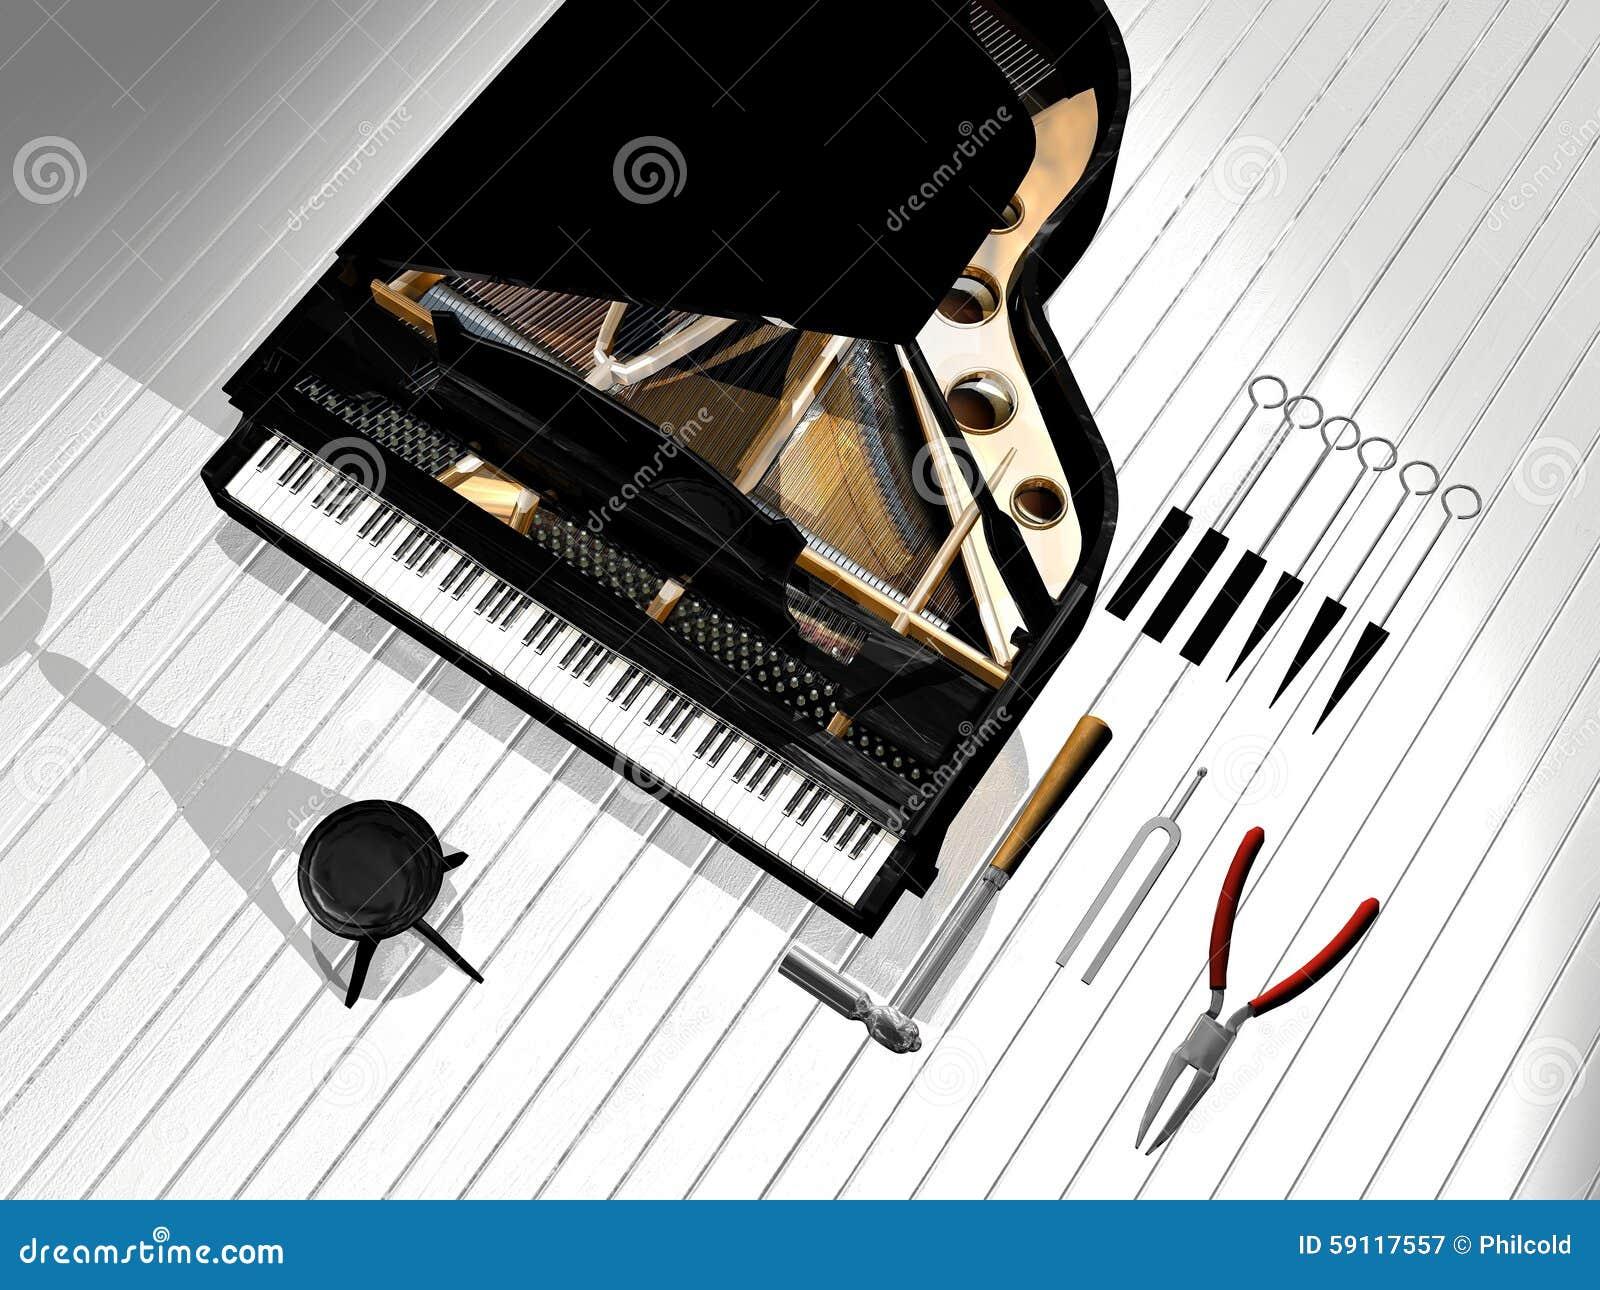 piano repair business card stock illustration  image: 59117557